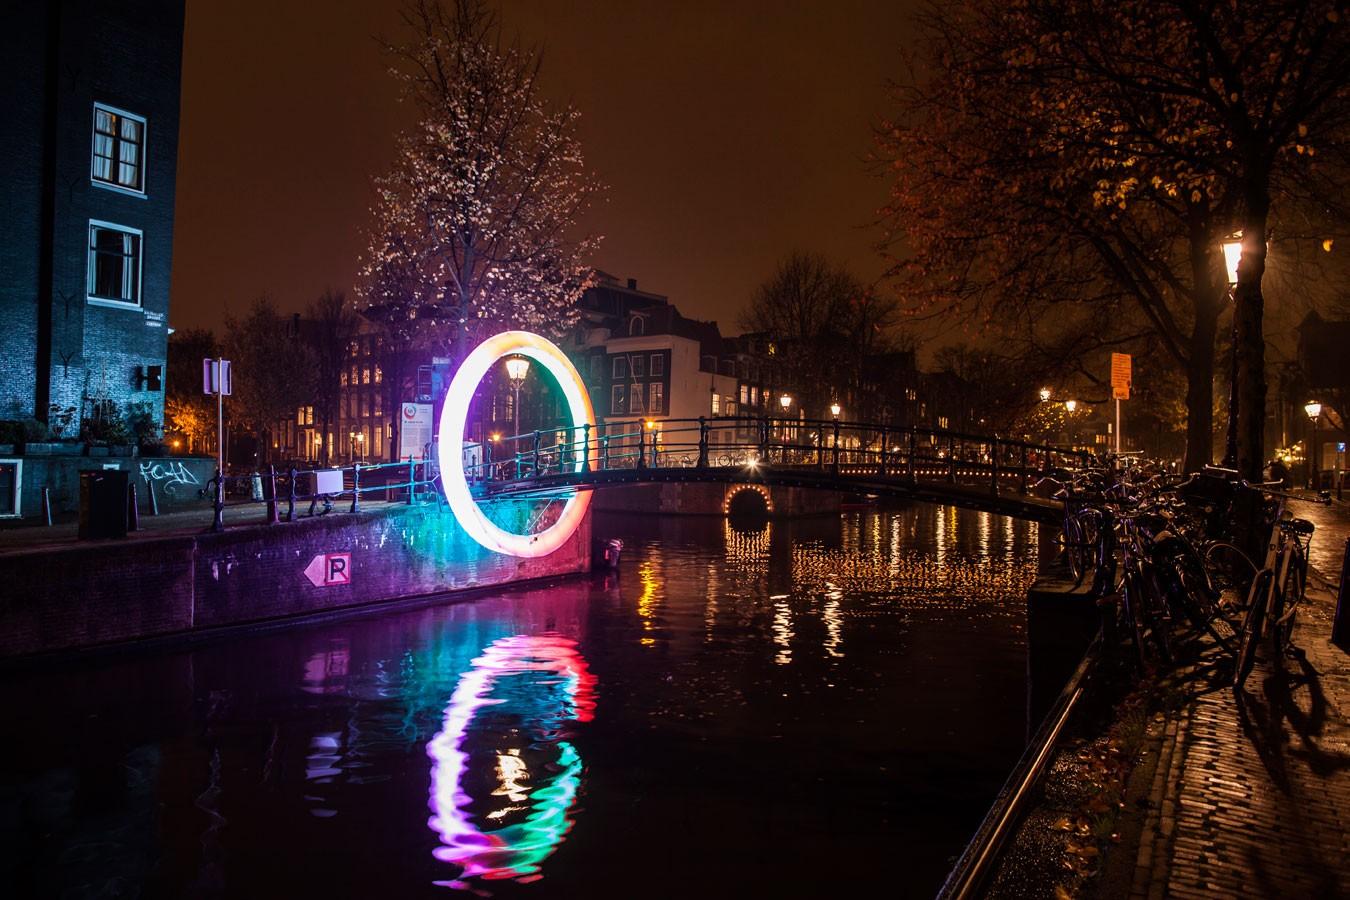 Circle of Life by Rob van Houten